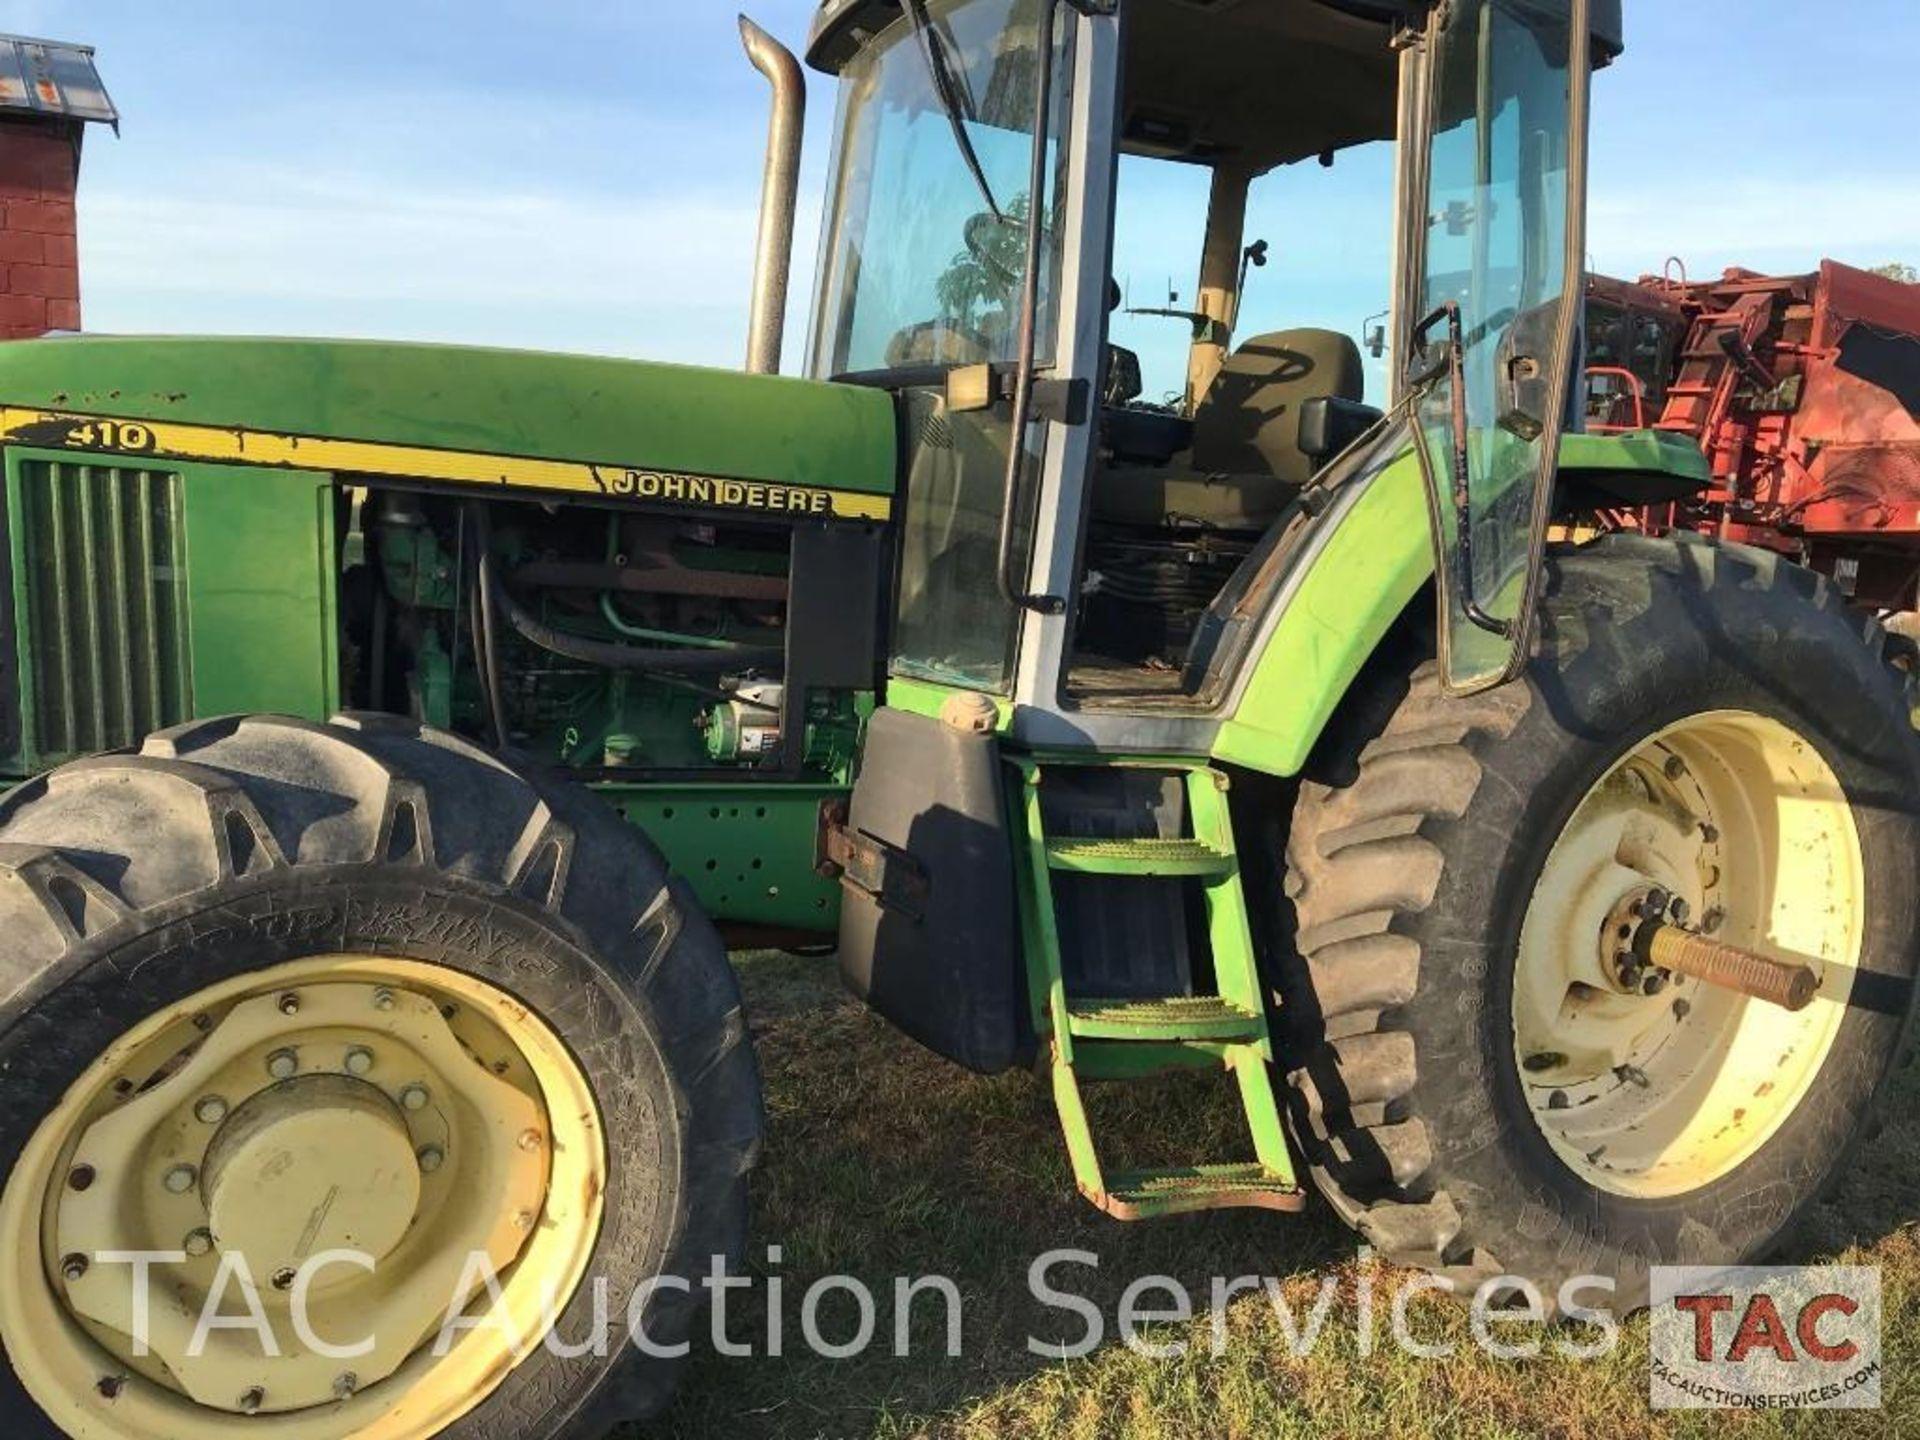 John Deere 7410 Farm Tractor - Image 2 of 24